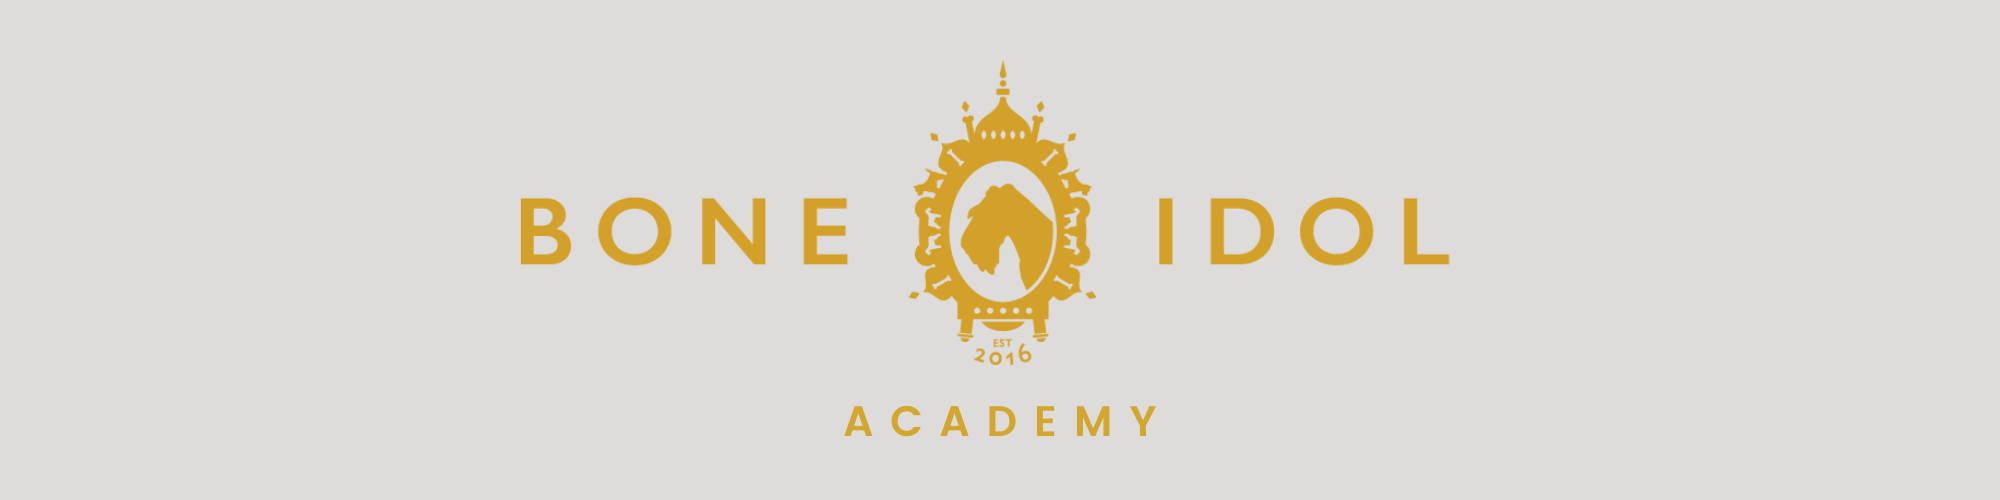 Bone Idol Dog Grooming Training Academy, Dog Grooming Qualification, How to become a dog groomer,  Dog Grooming courses, Bone Idol